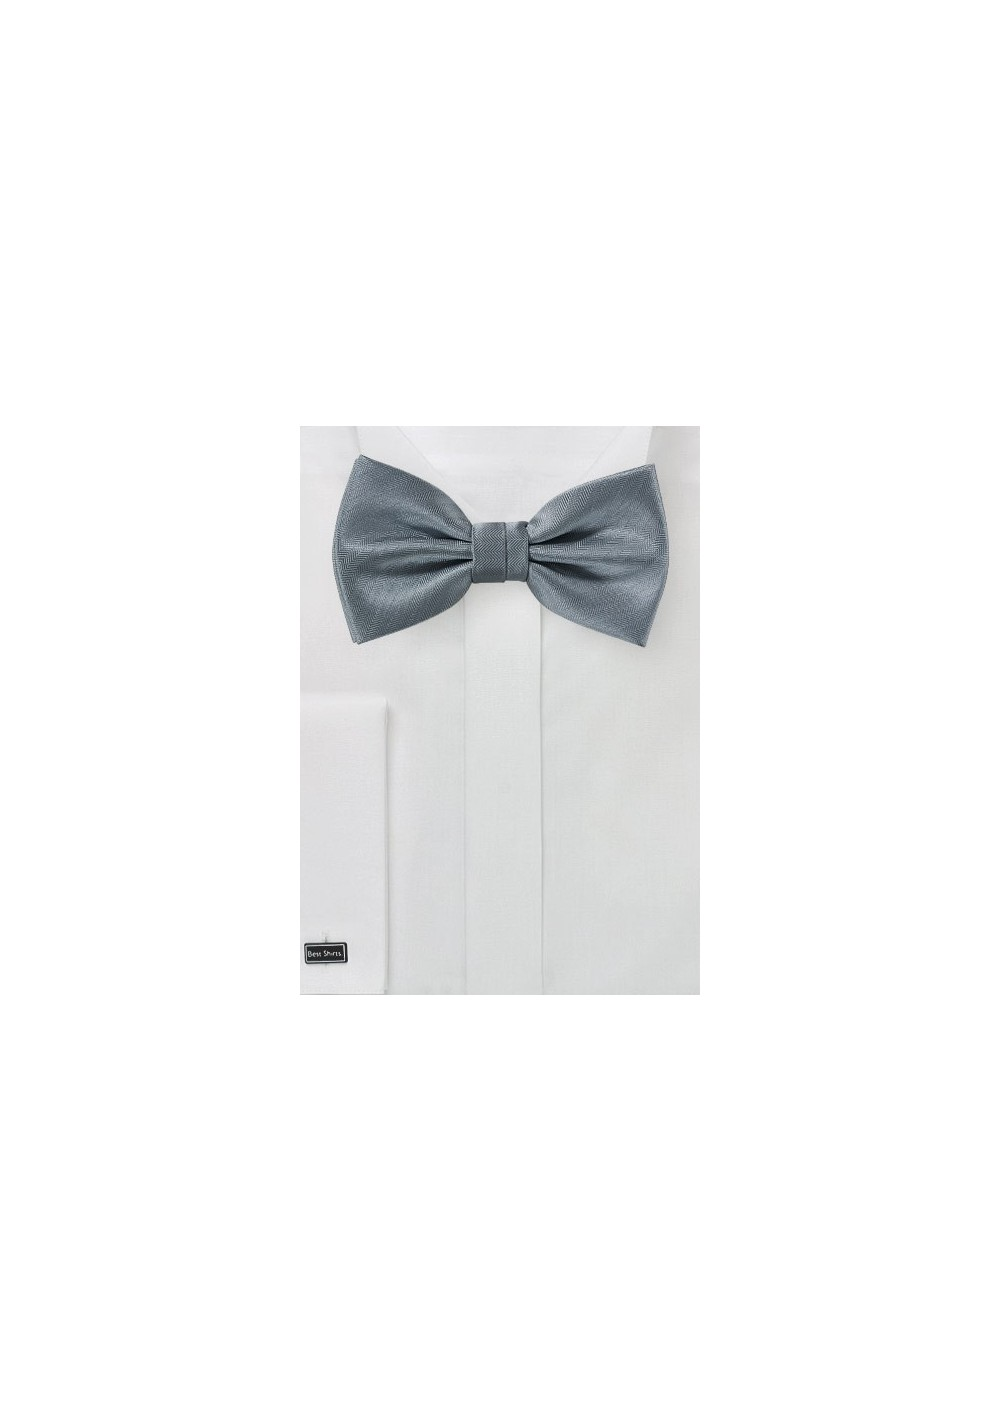 Elegant Bow Tie in Obsidian Gray